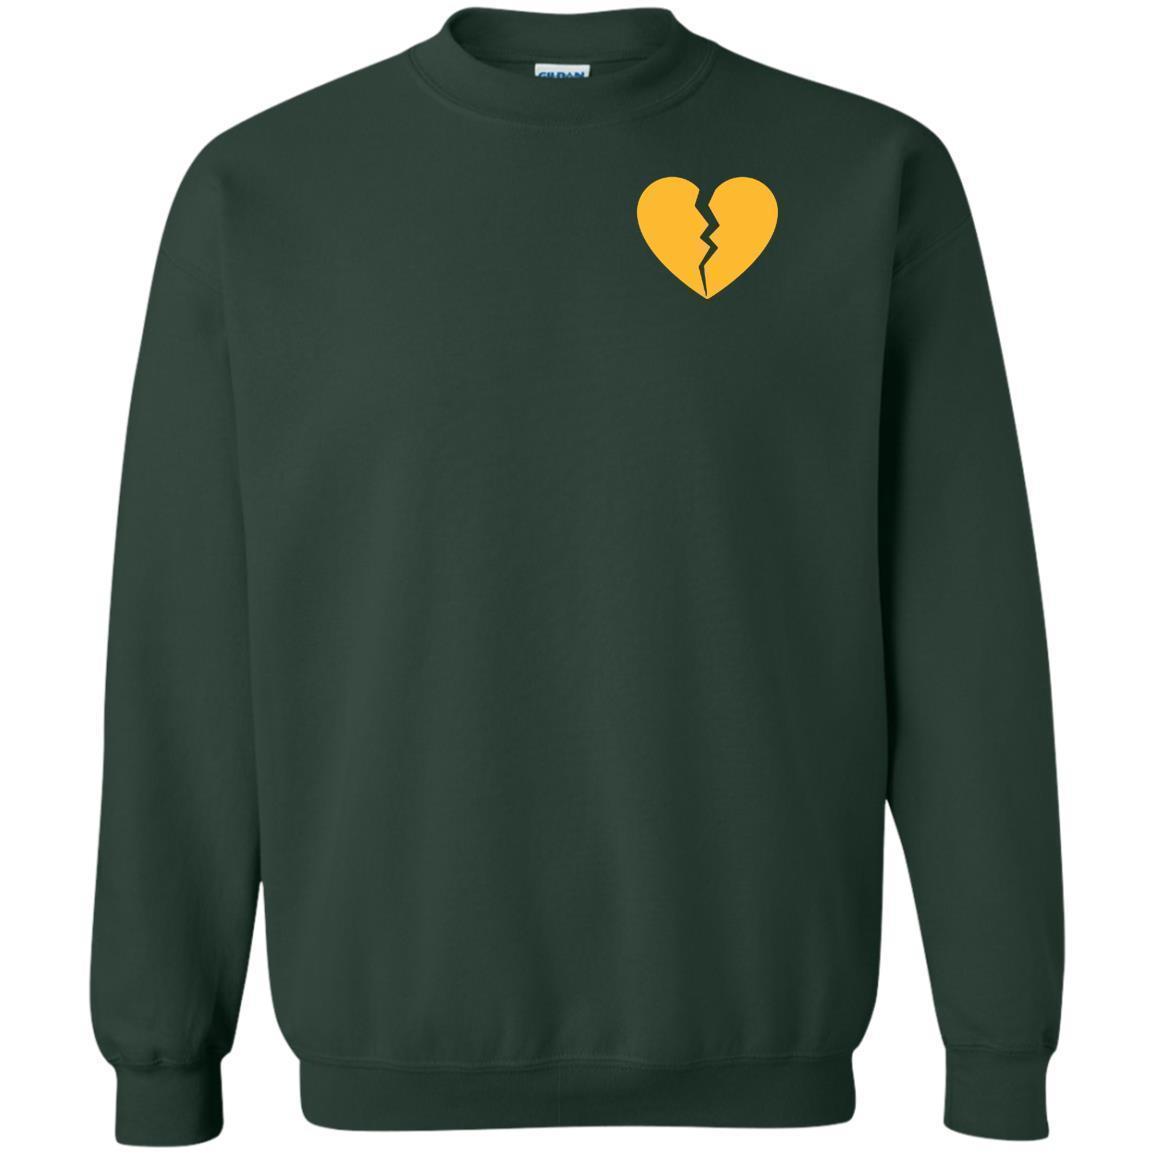 Marcus Lemonis Heart Logo On Sweater.